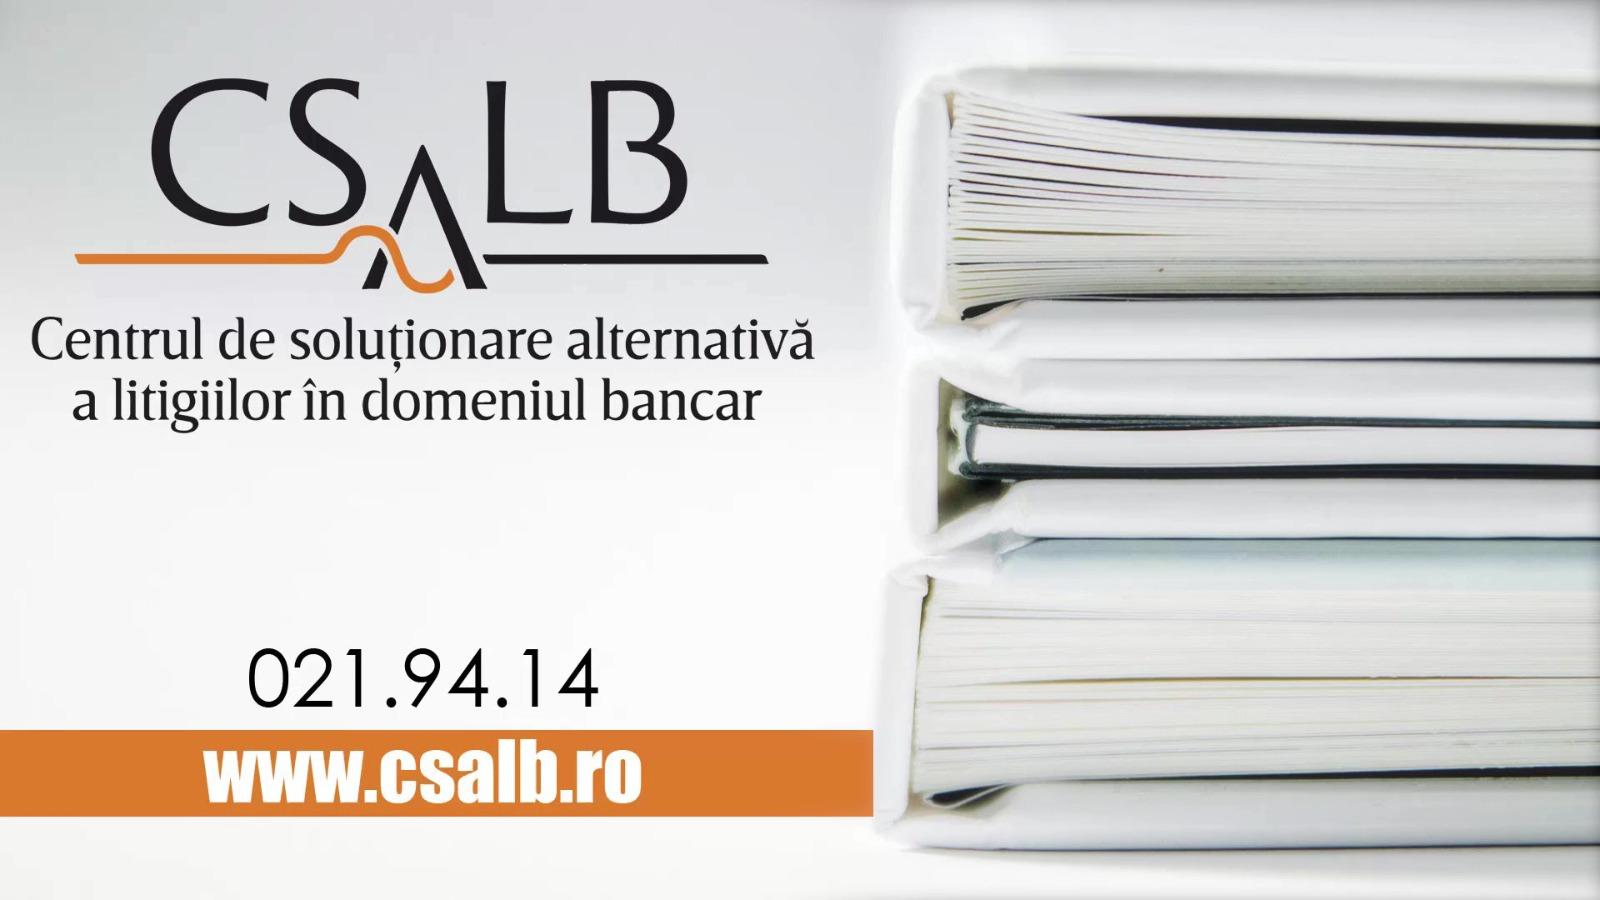 csalab logo